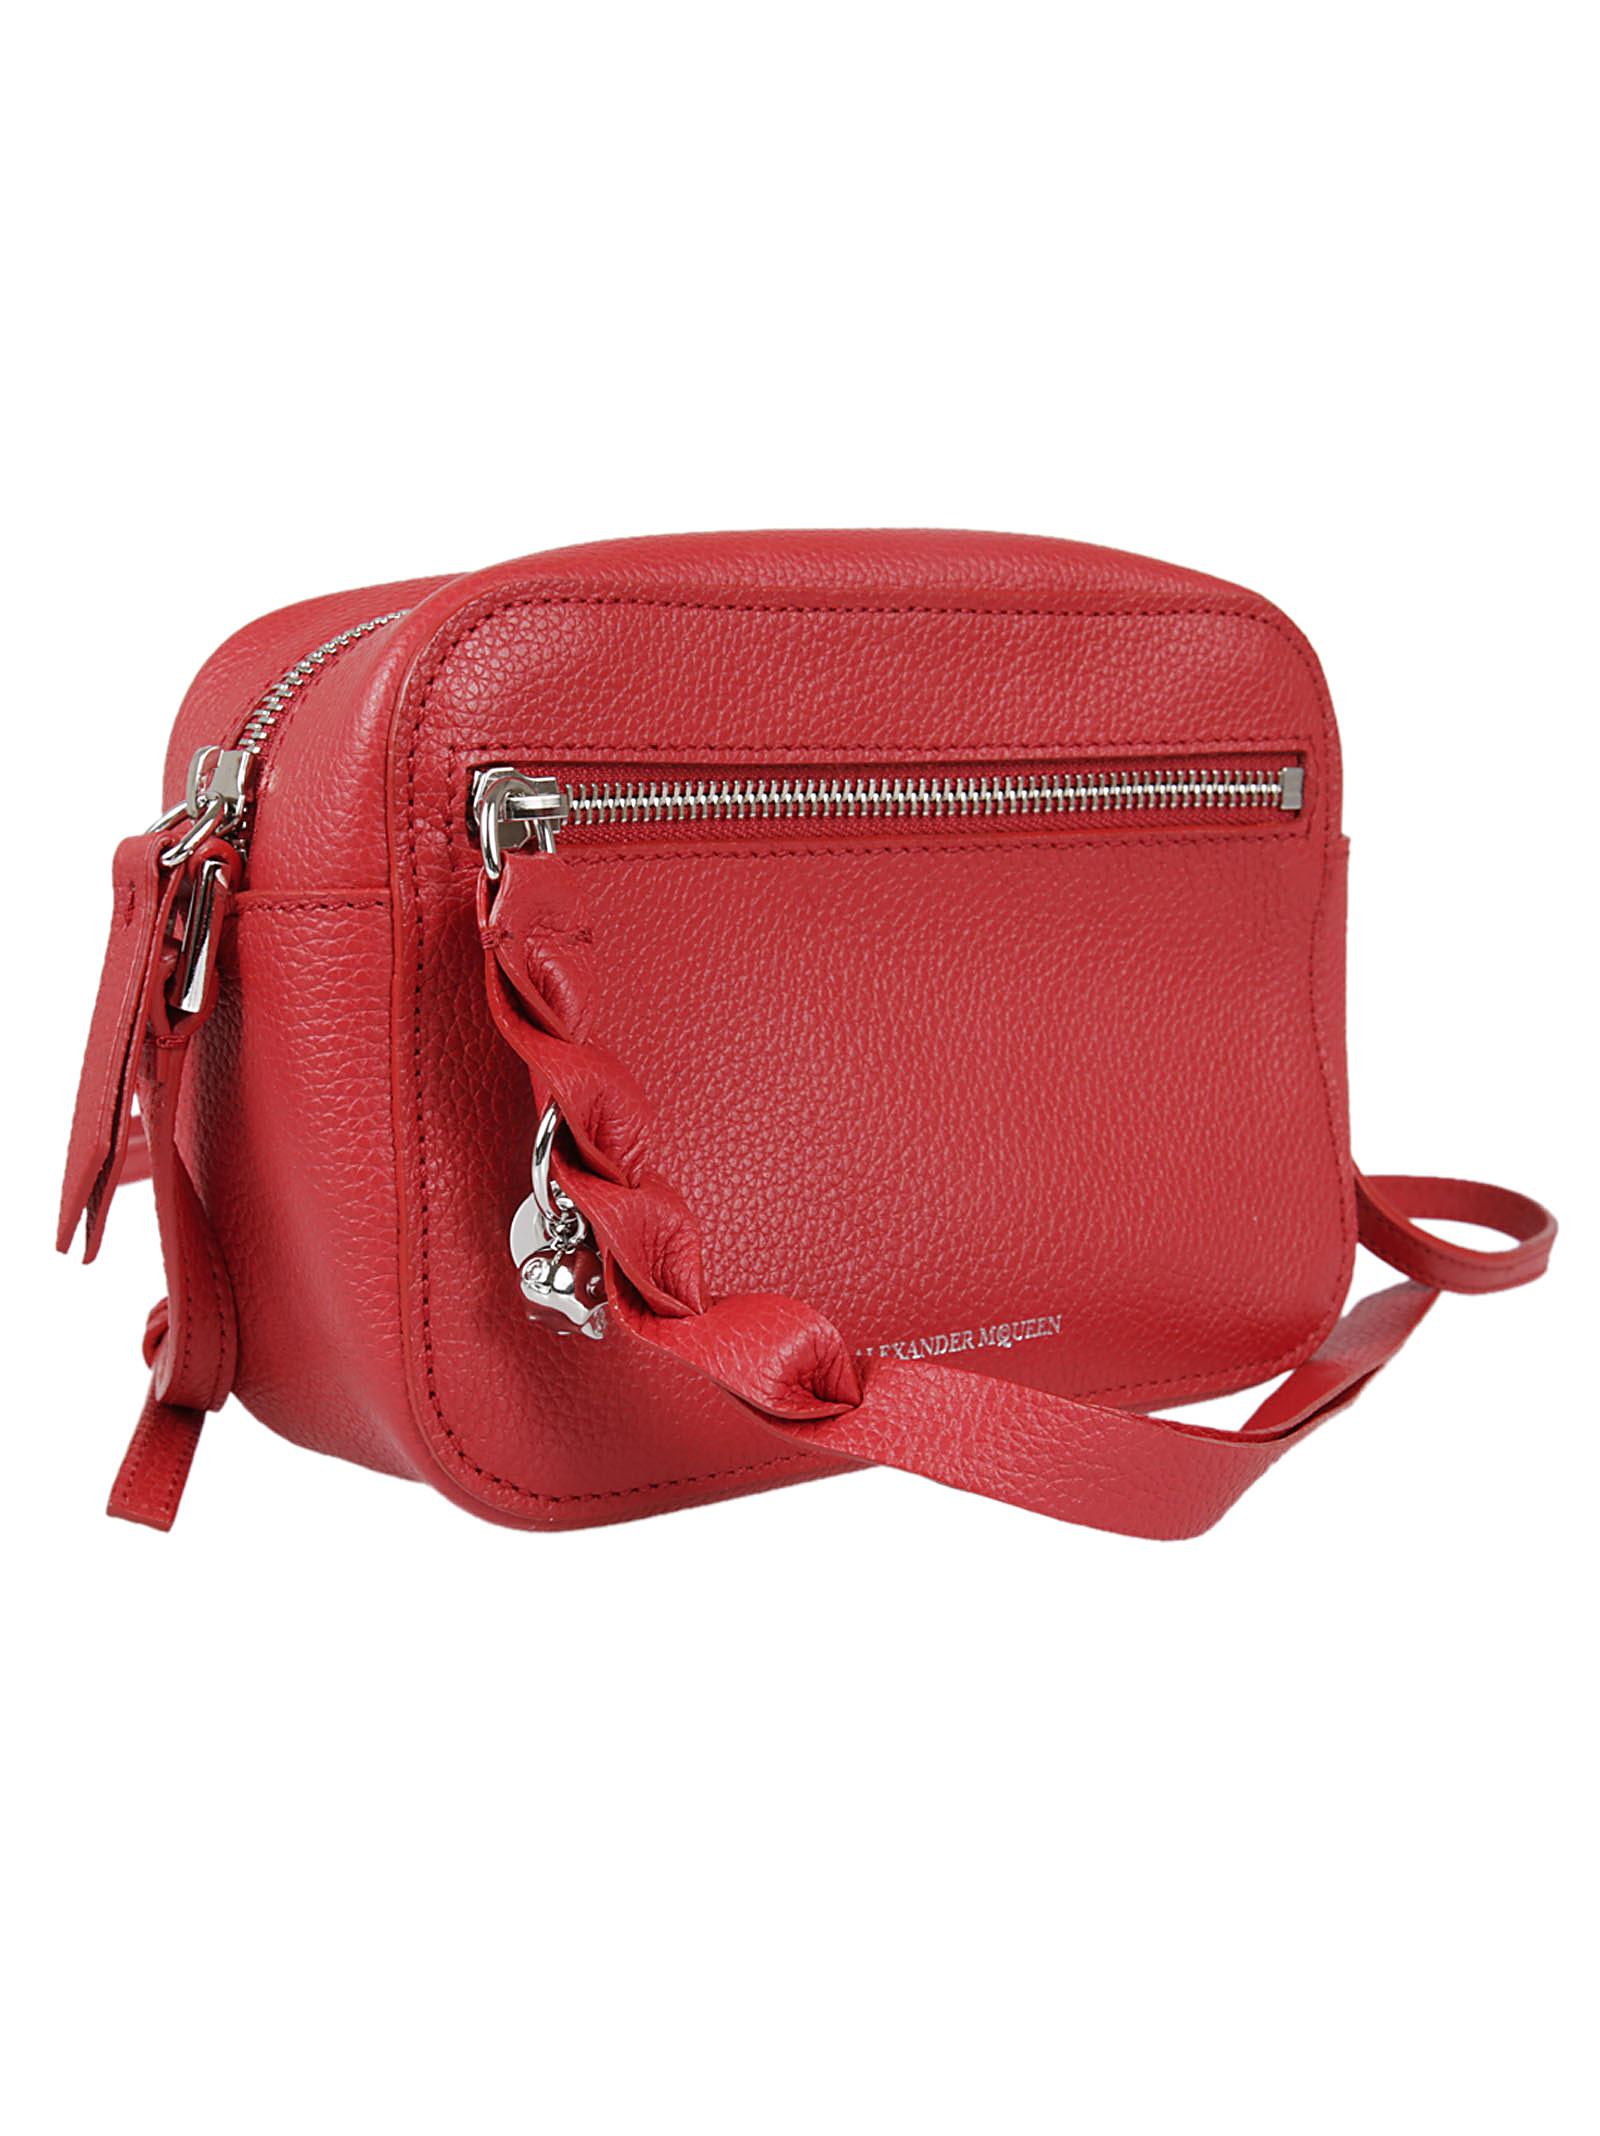 Alexander McQueen Alexander McQueen Tassel Detail Shoulder Bag